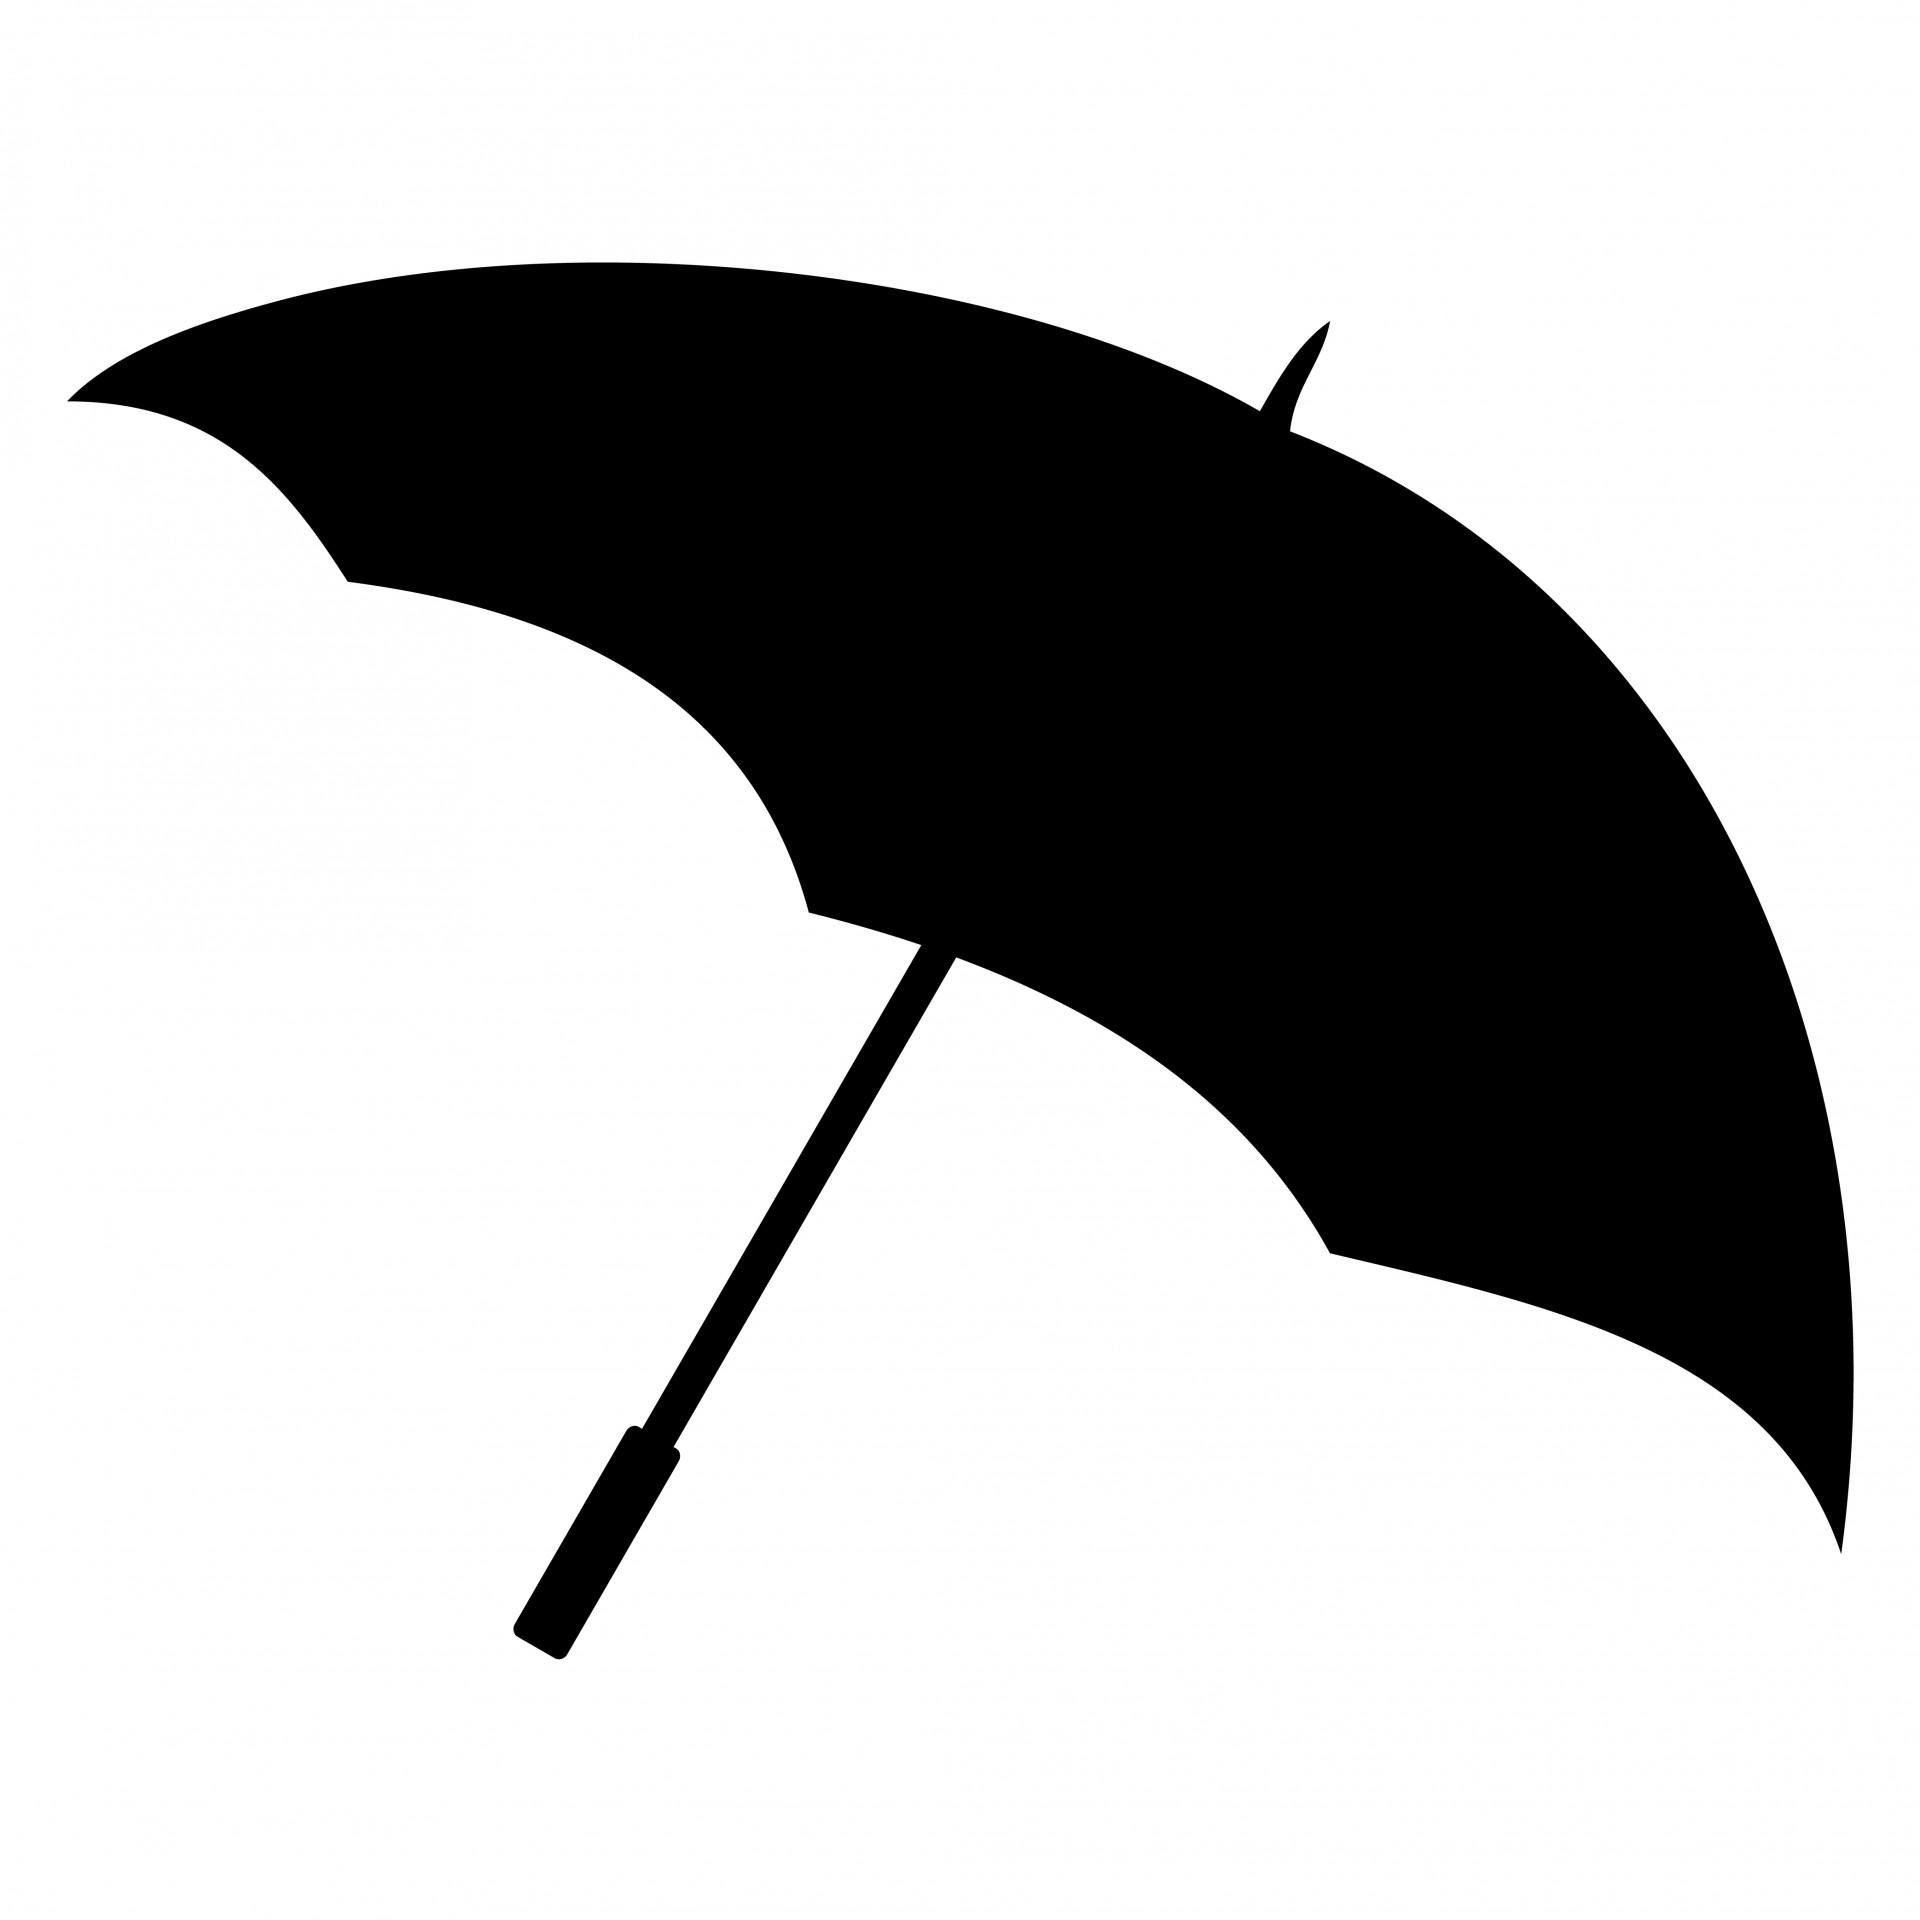 Umbrella clipart. Free stock photo public